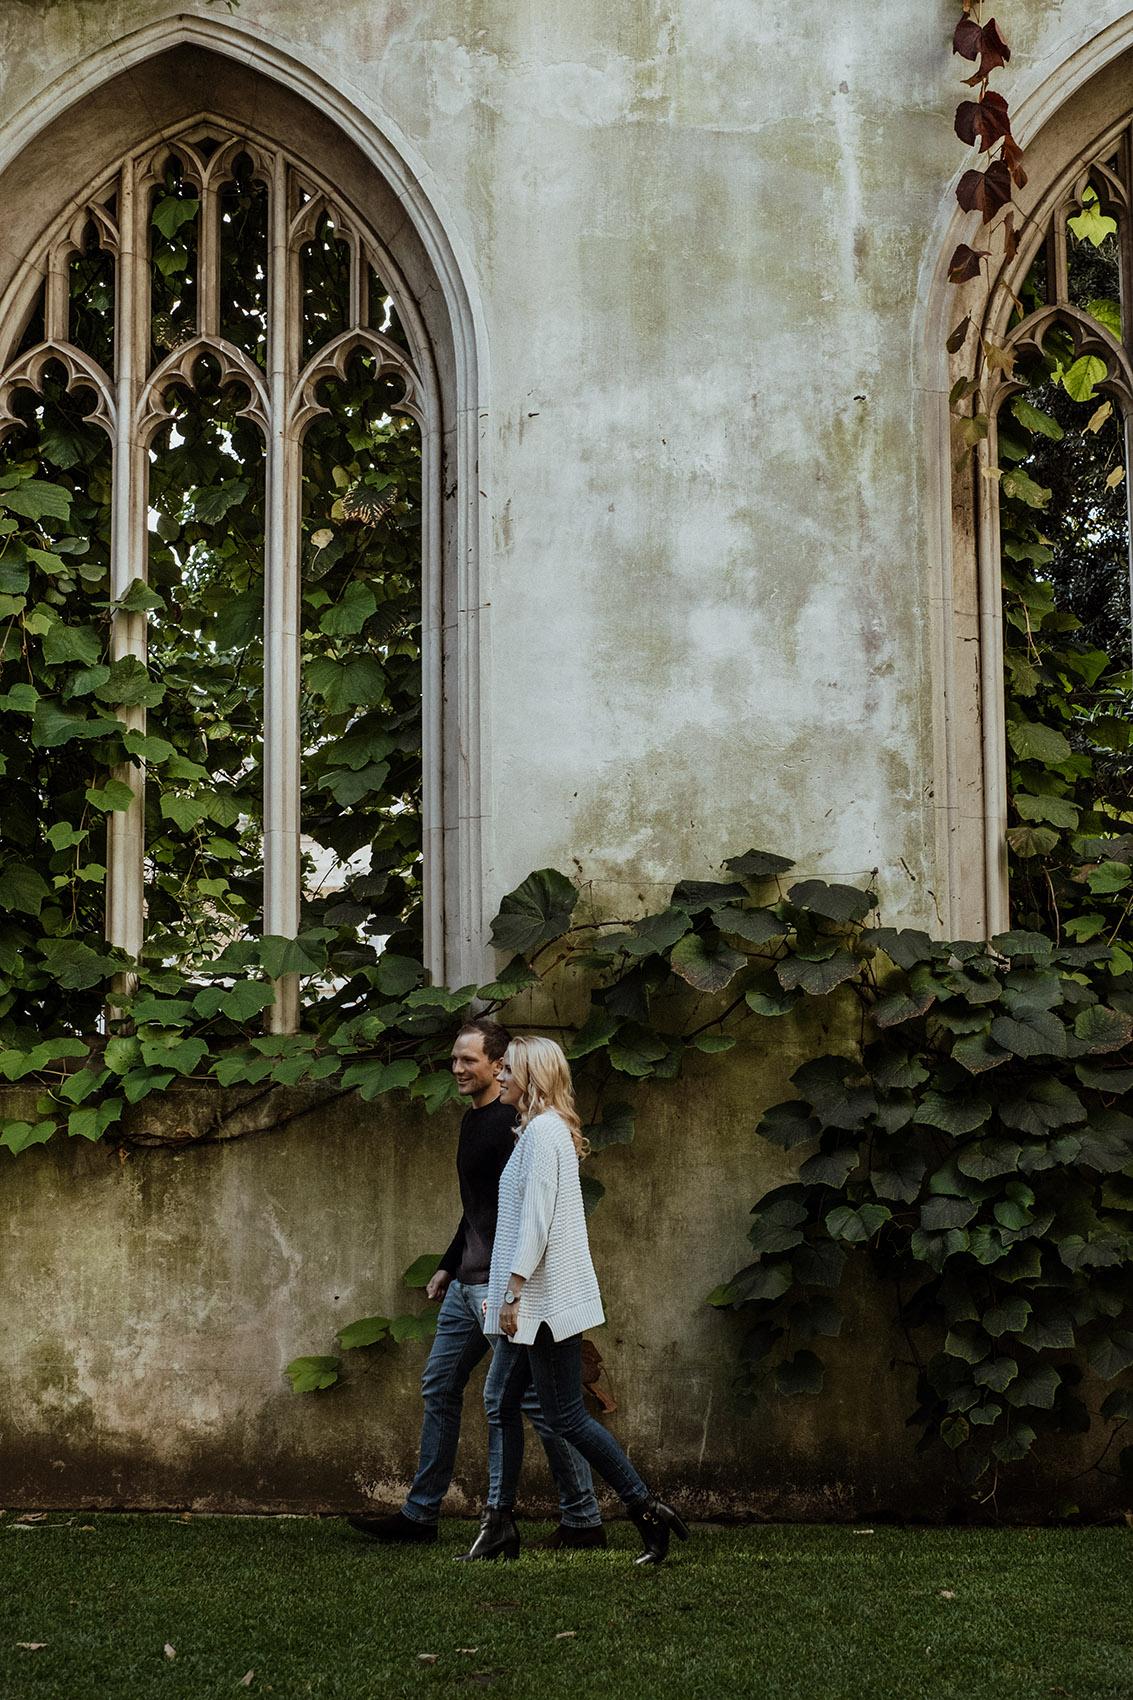 Anna-Vesty-London-engagement-shoot-6.jpg